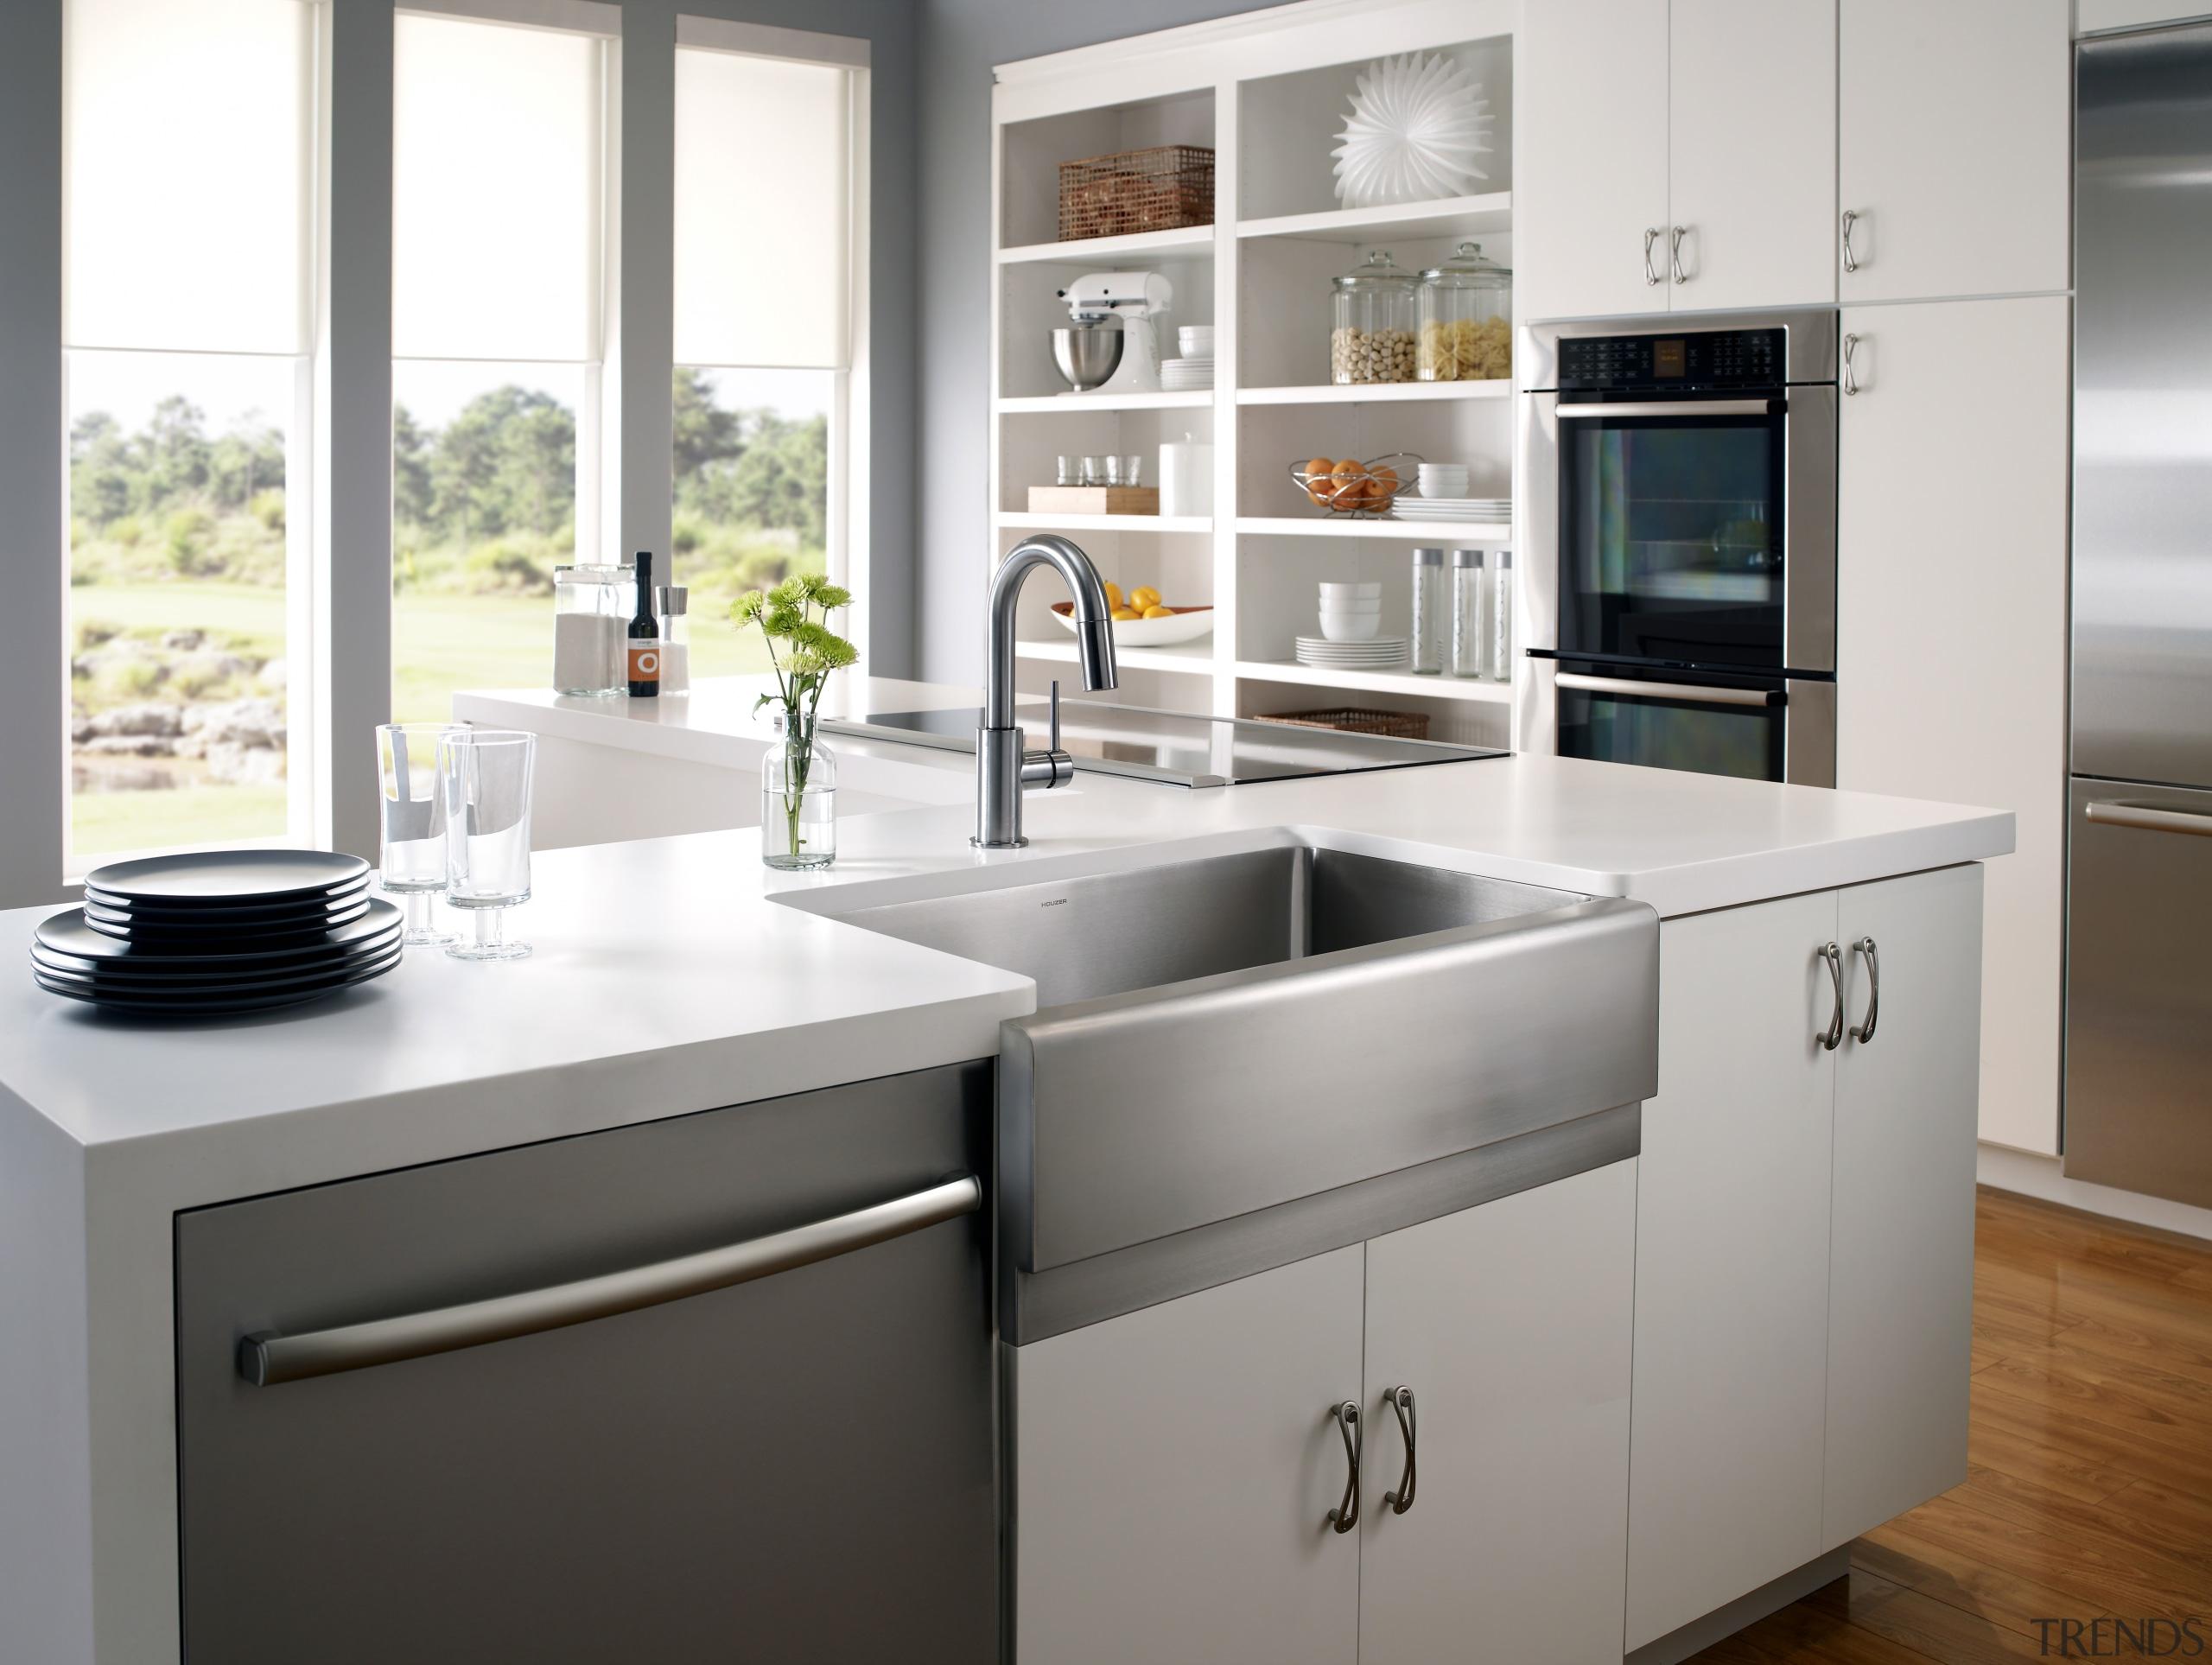 Epicure apron front sink by Houzer - Epicure cabinetry, countertop, cuisine classique, home appliance, kitchen, kitchen appliance, kitchen stove, product design, white, gray